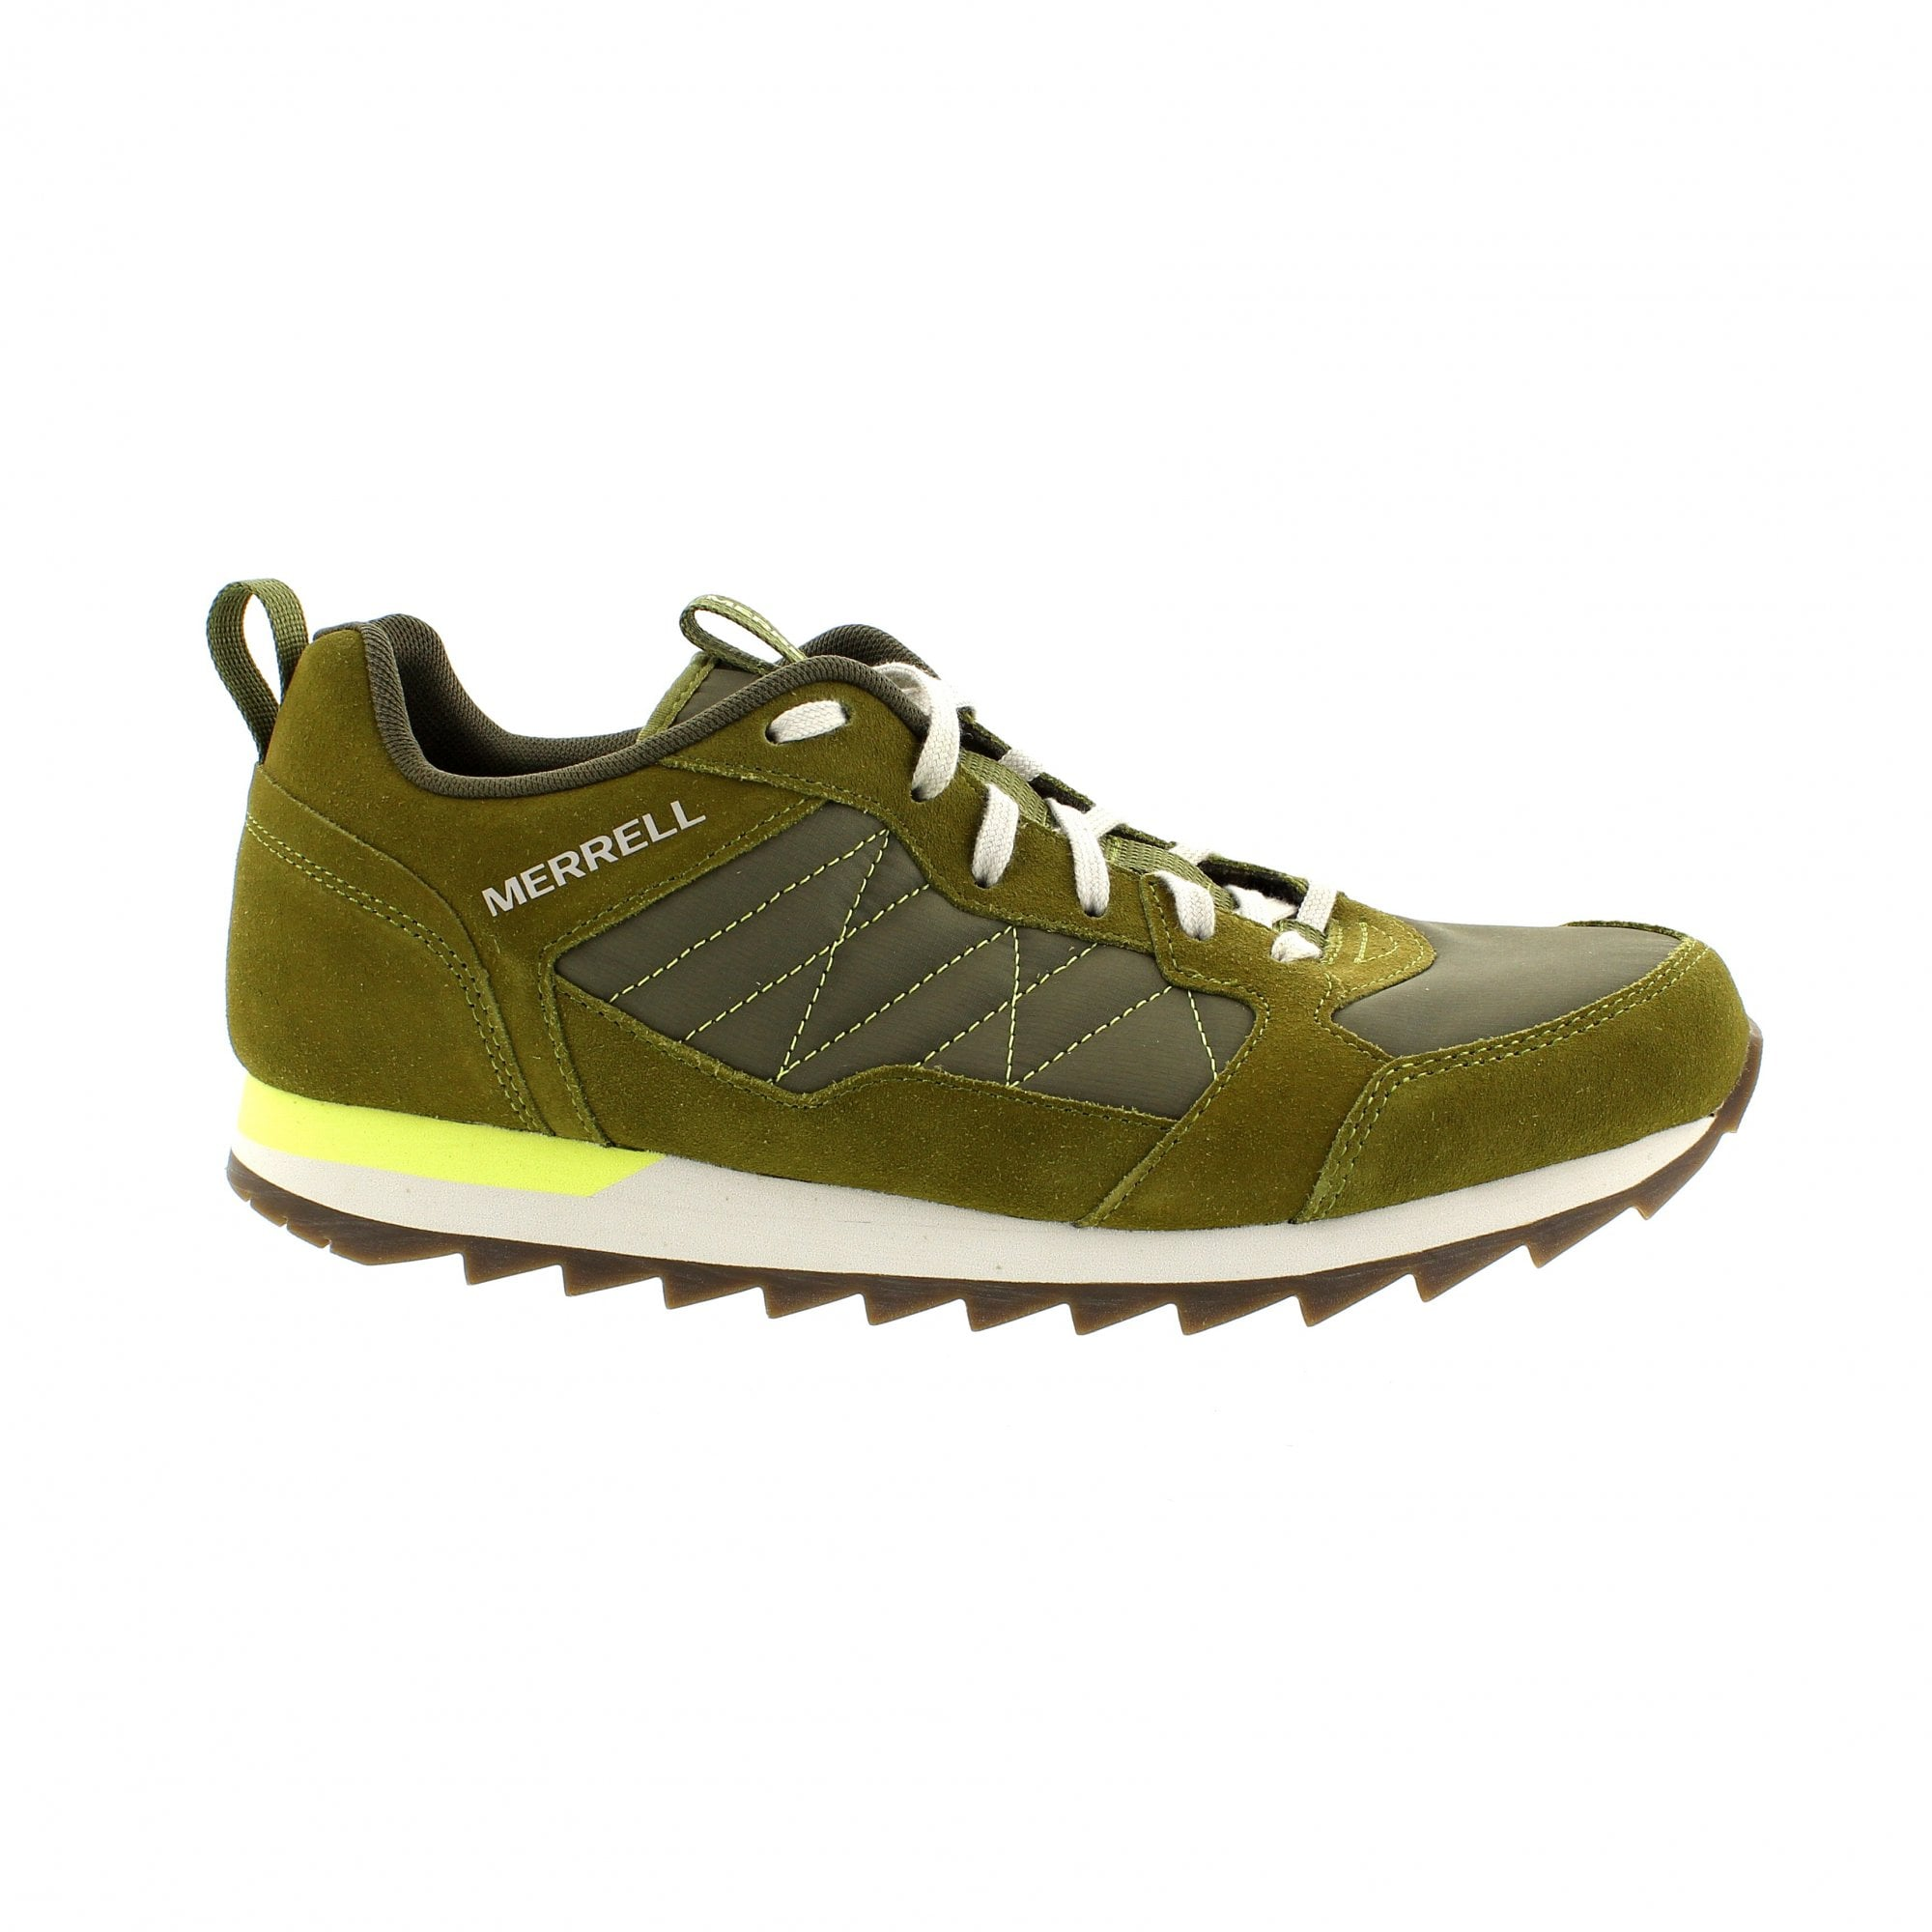 Merrell Alpine Sneaker Outdoor Trekkingschuhe Wanderschuhe Sneaker J16697